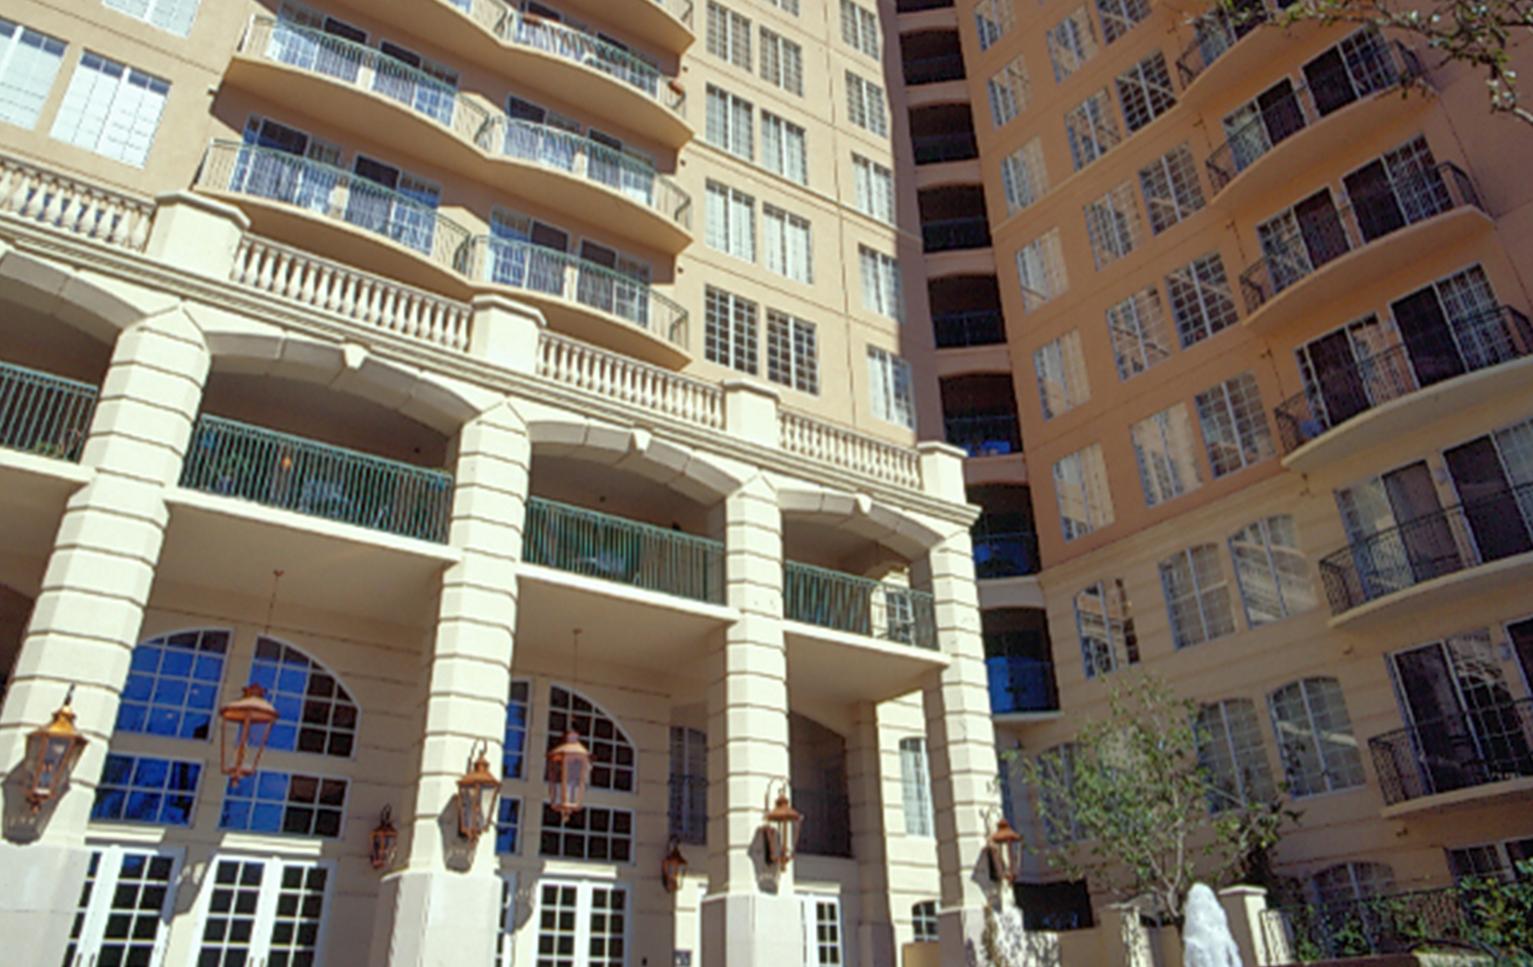 Turtle Creek Villas   Dallas, TX | Units: 331 | High Rise | 14 Story